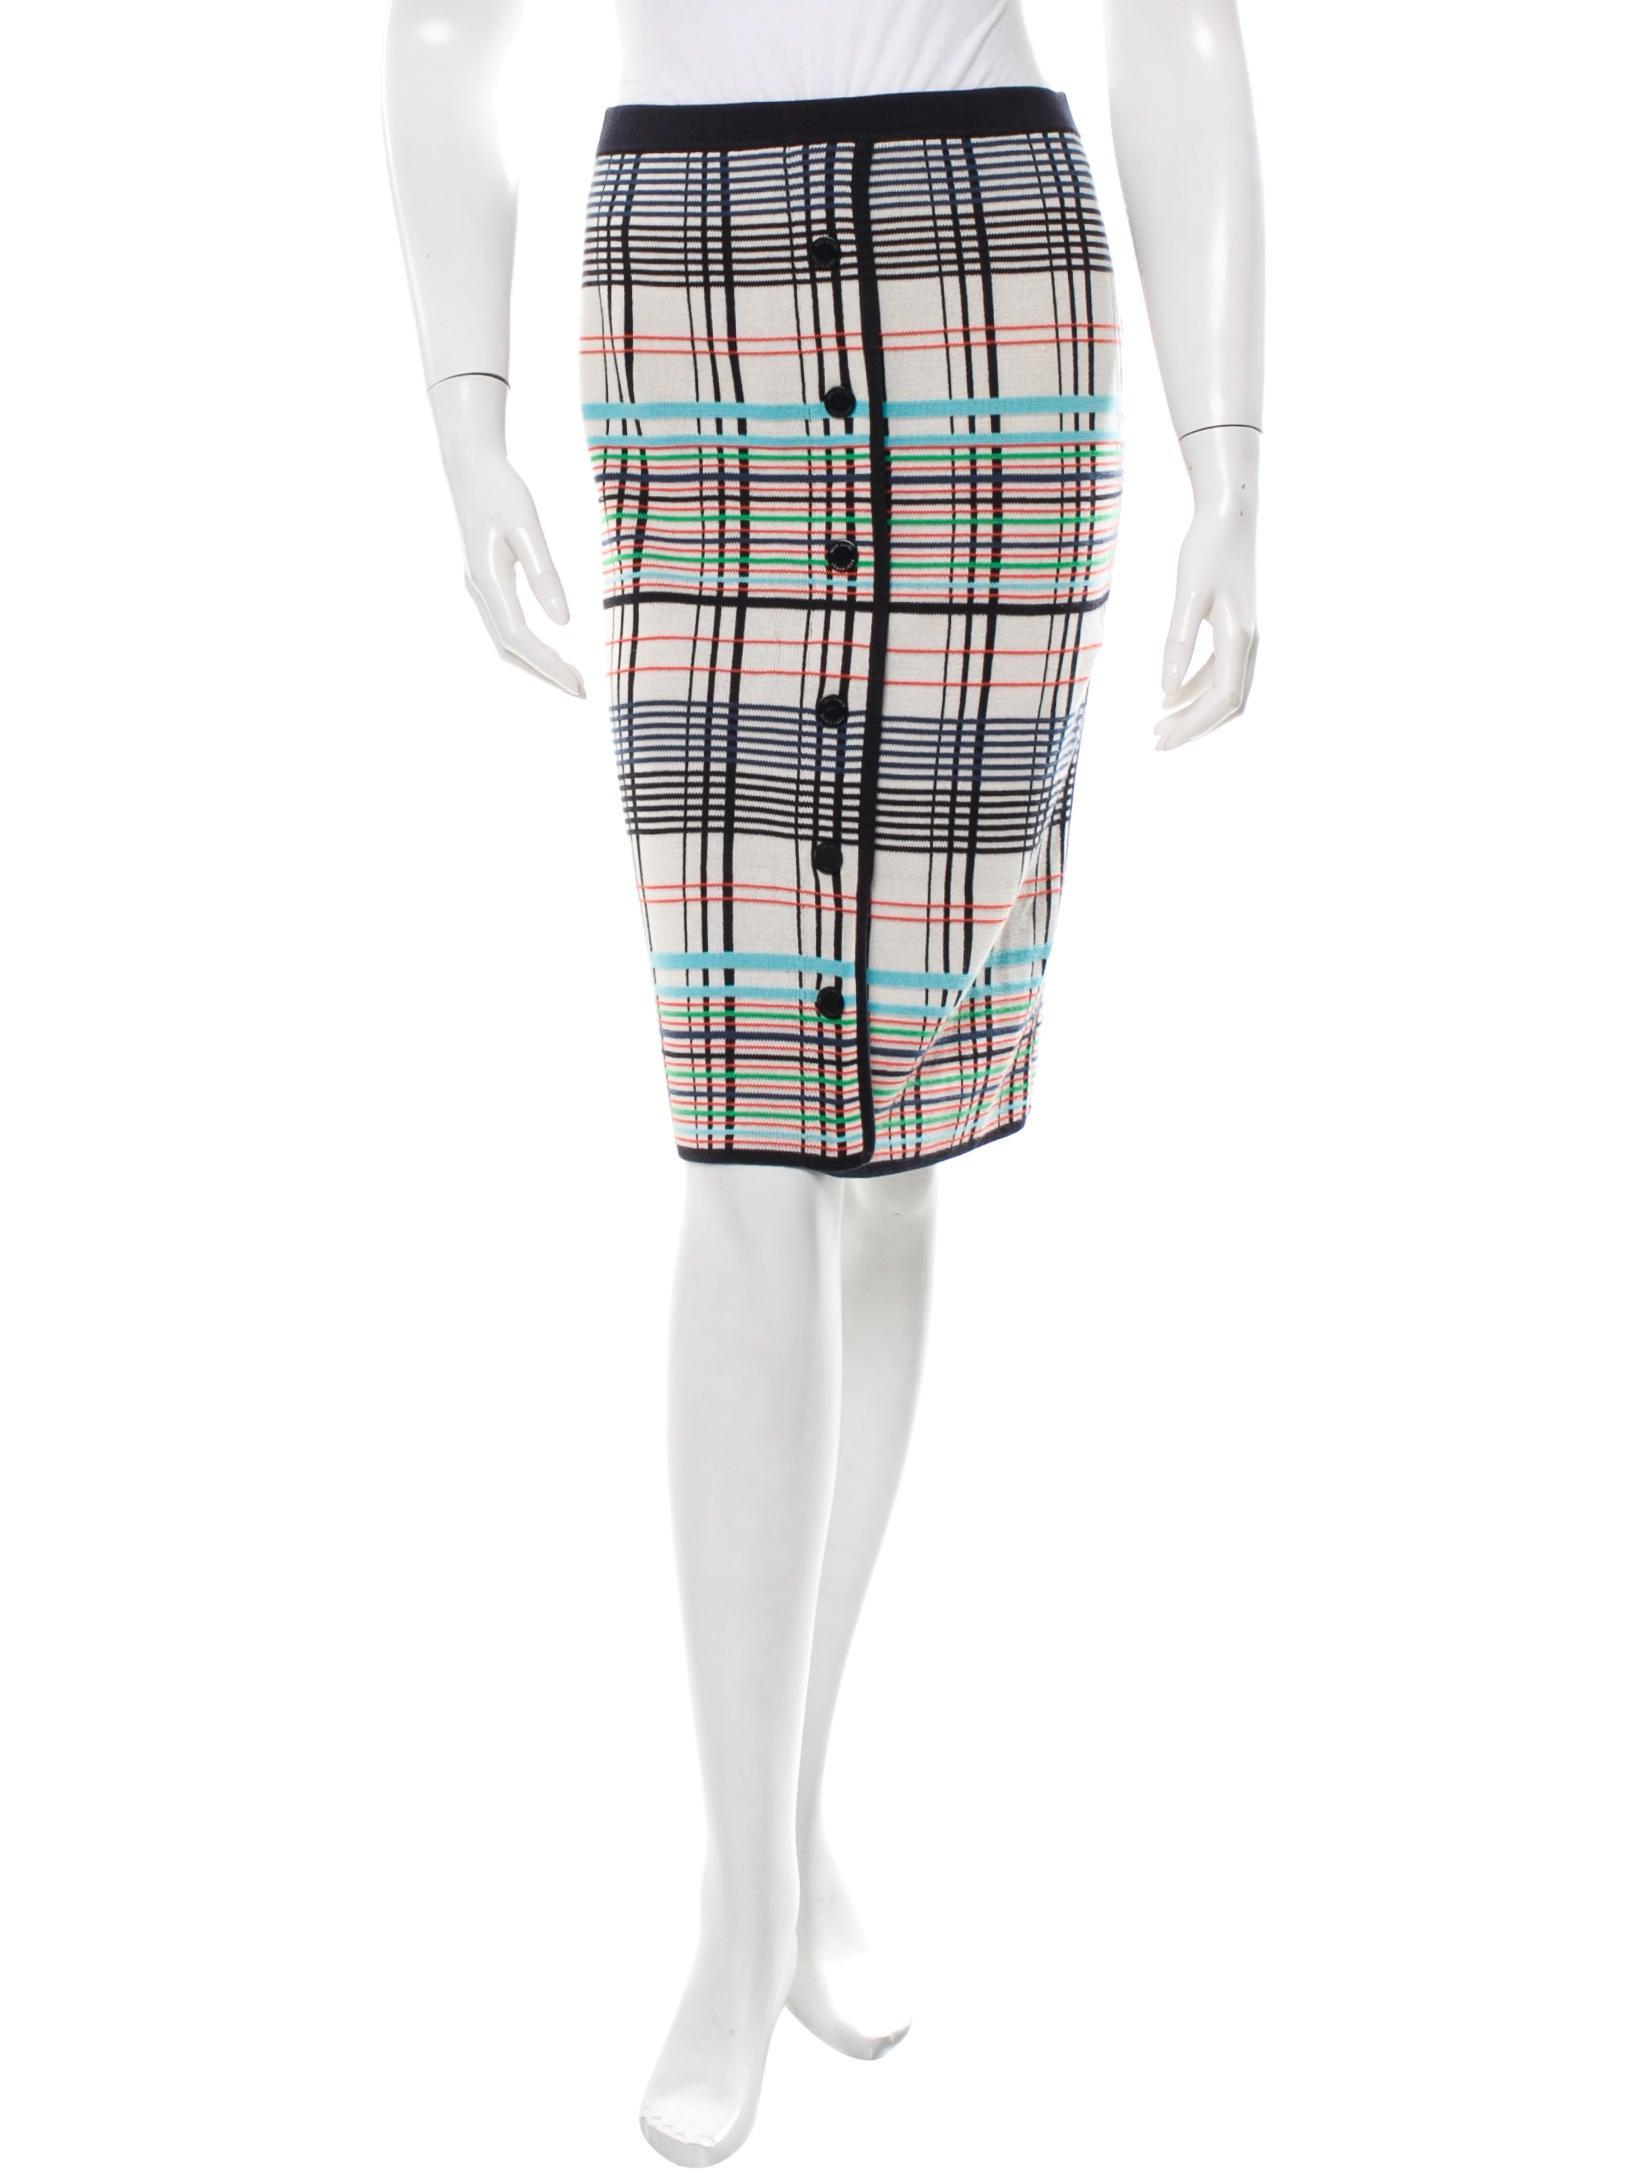 burch knee length plaid skirt clothing wto56603